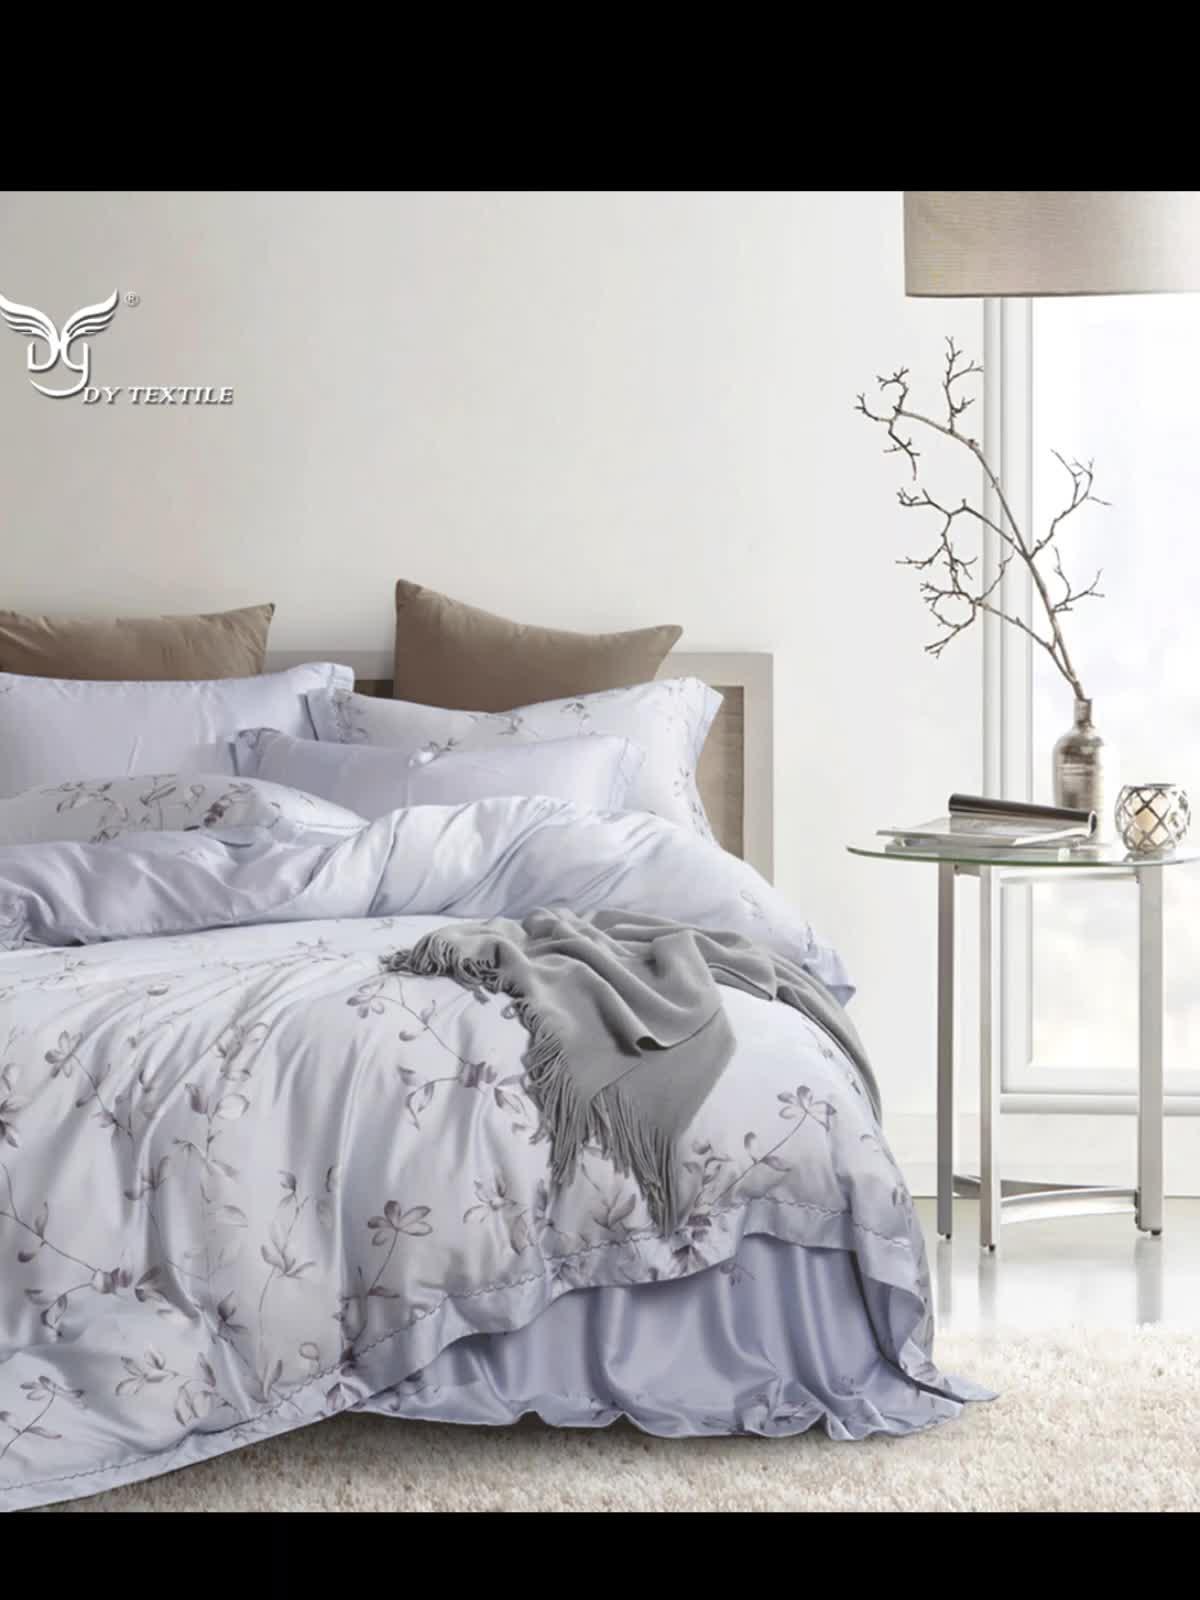 100% tencel hoa in 3/4 cái duvet cover và tấm ga trải giường quilt bộ đồ giường comforter set